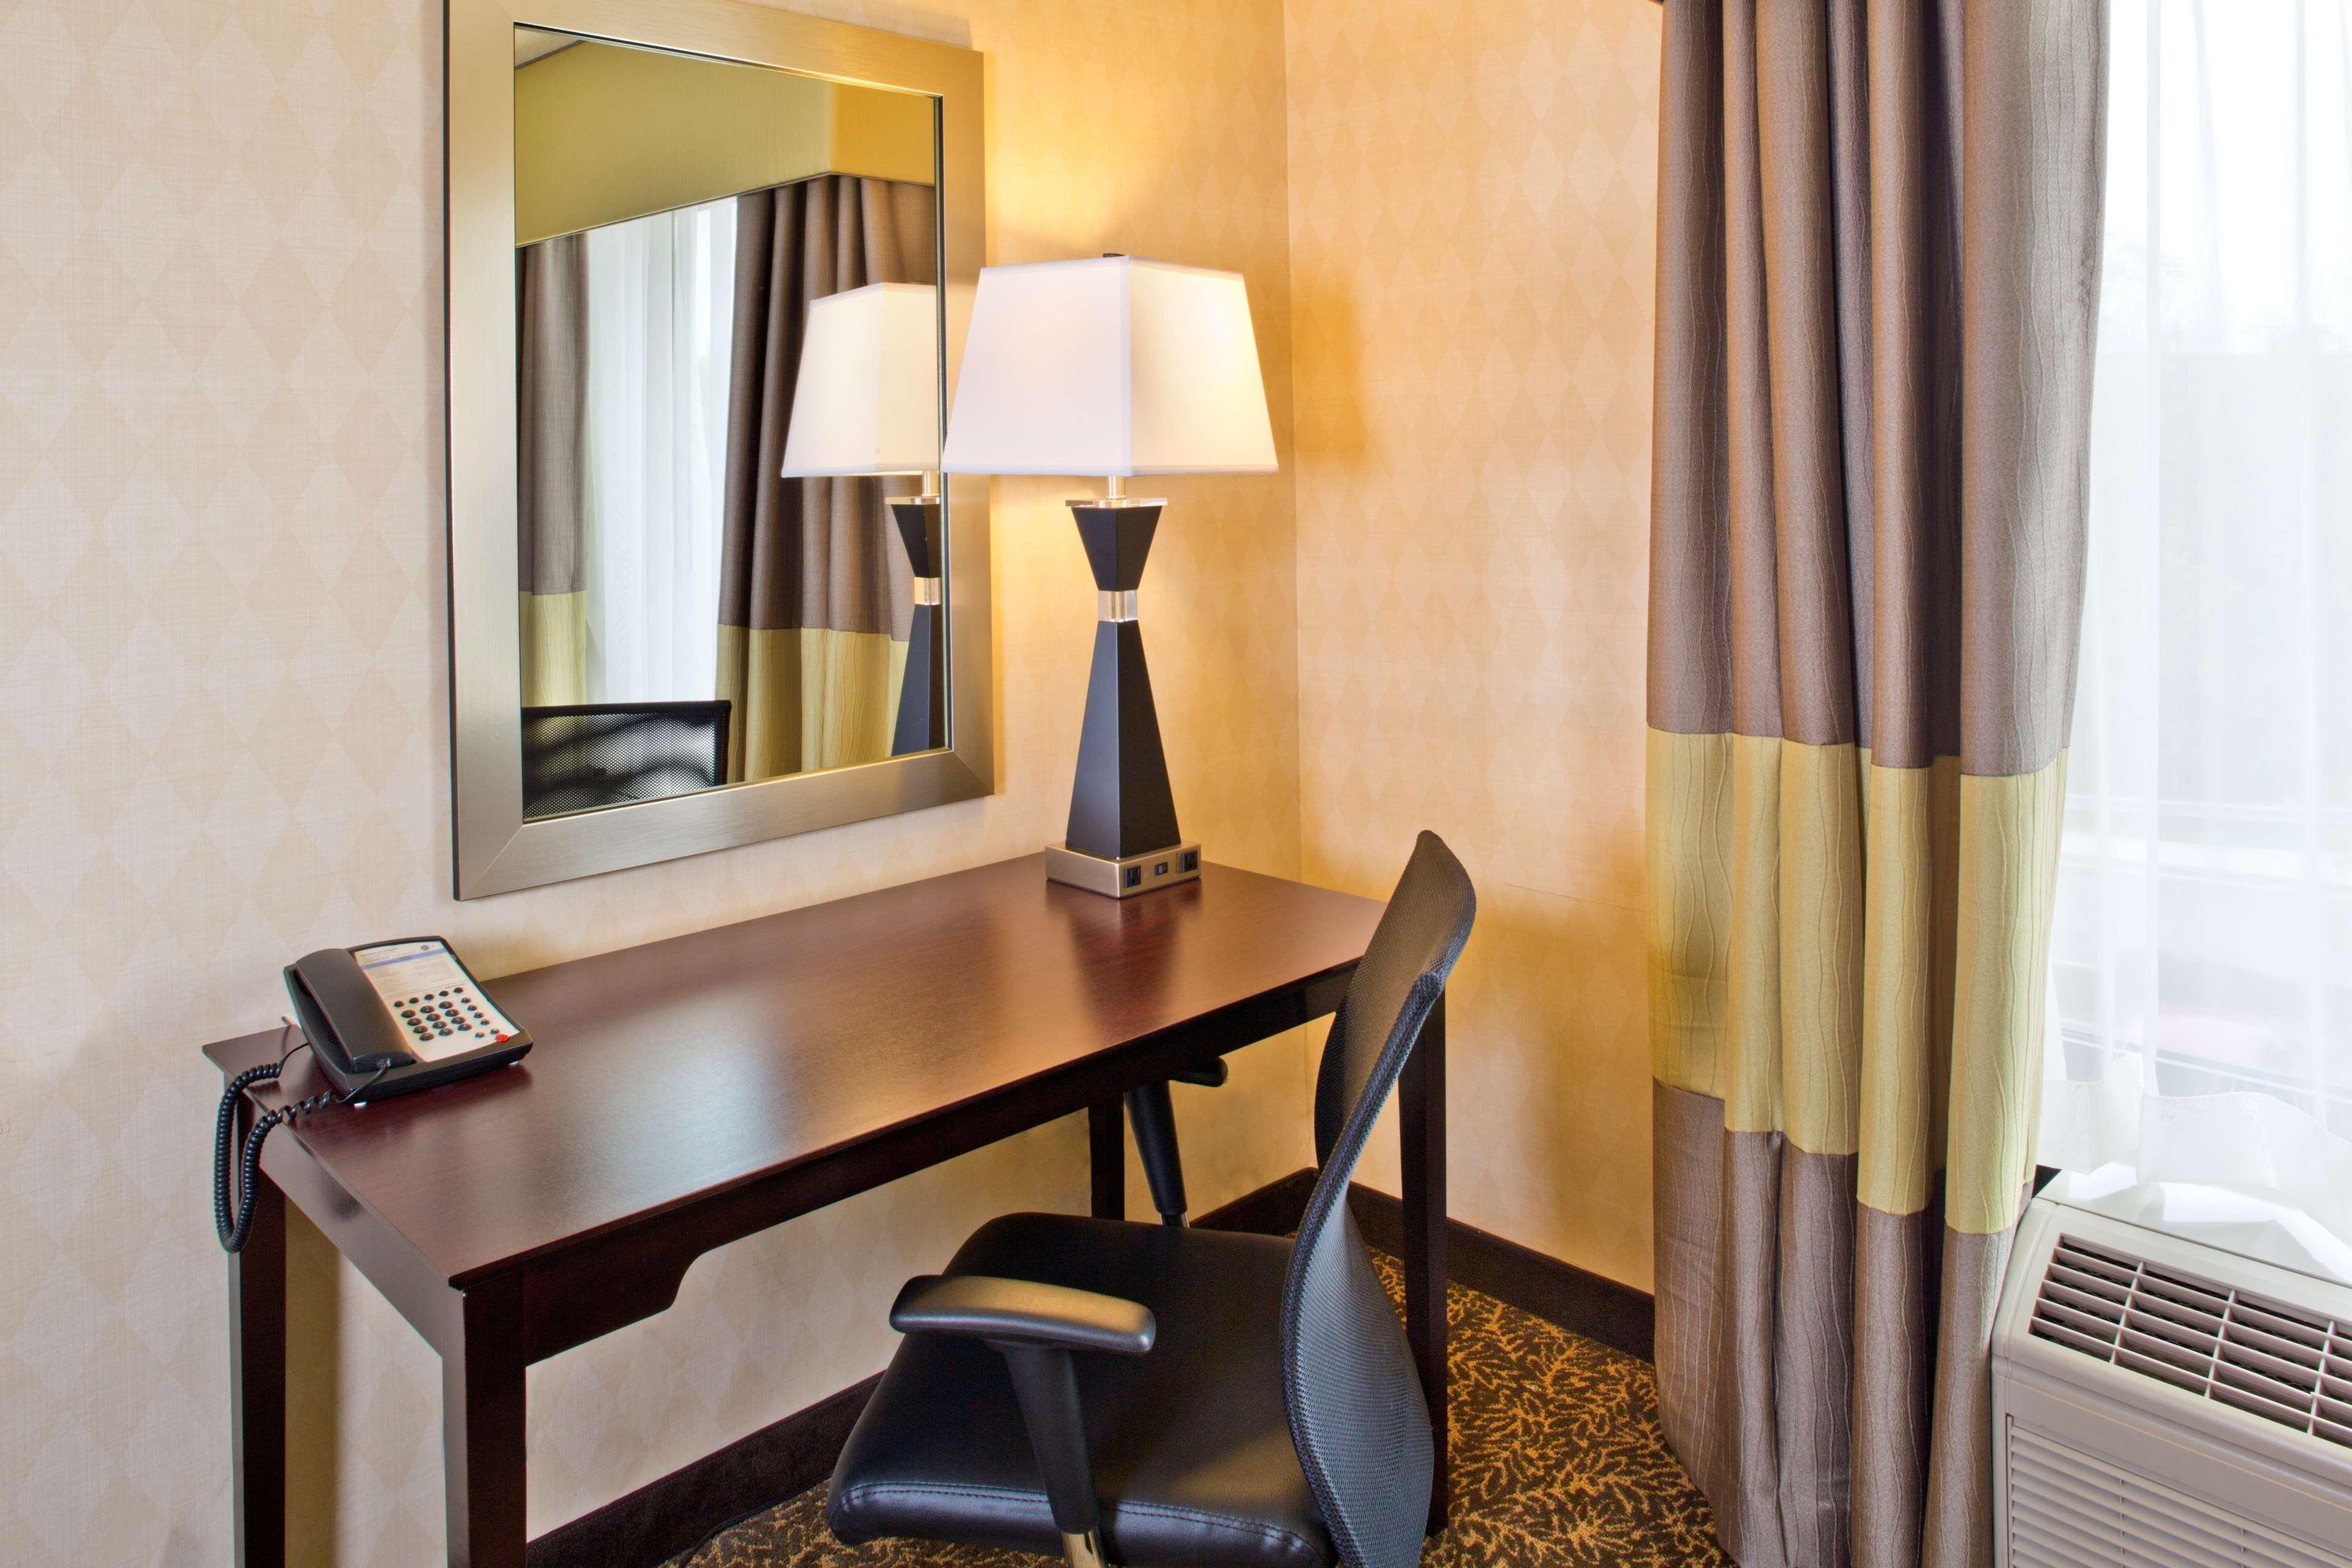 Hampton Inn & Suites Arundel Mills/Baltimore image 14